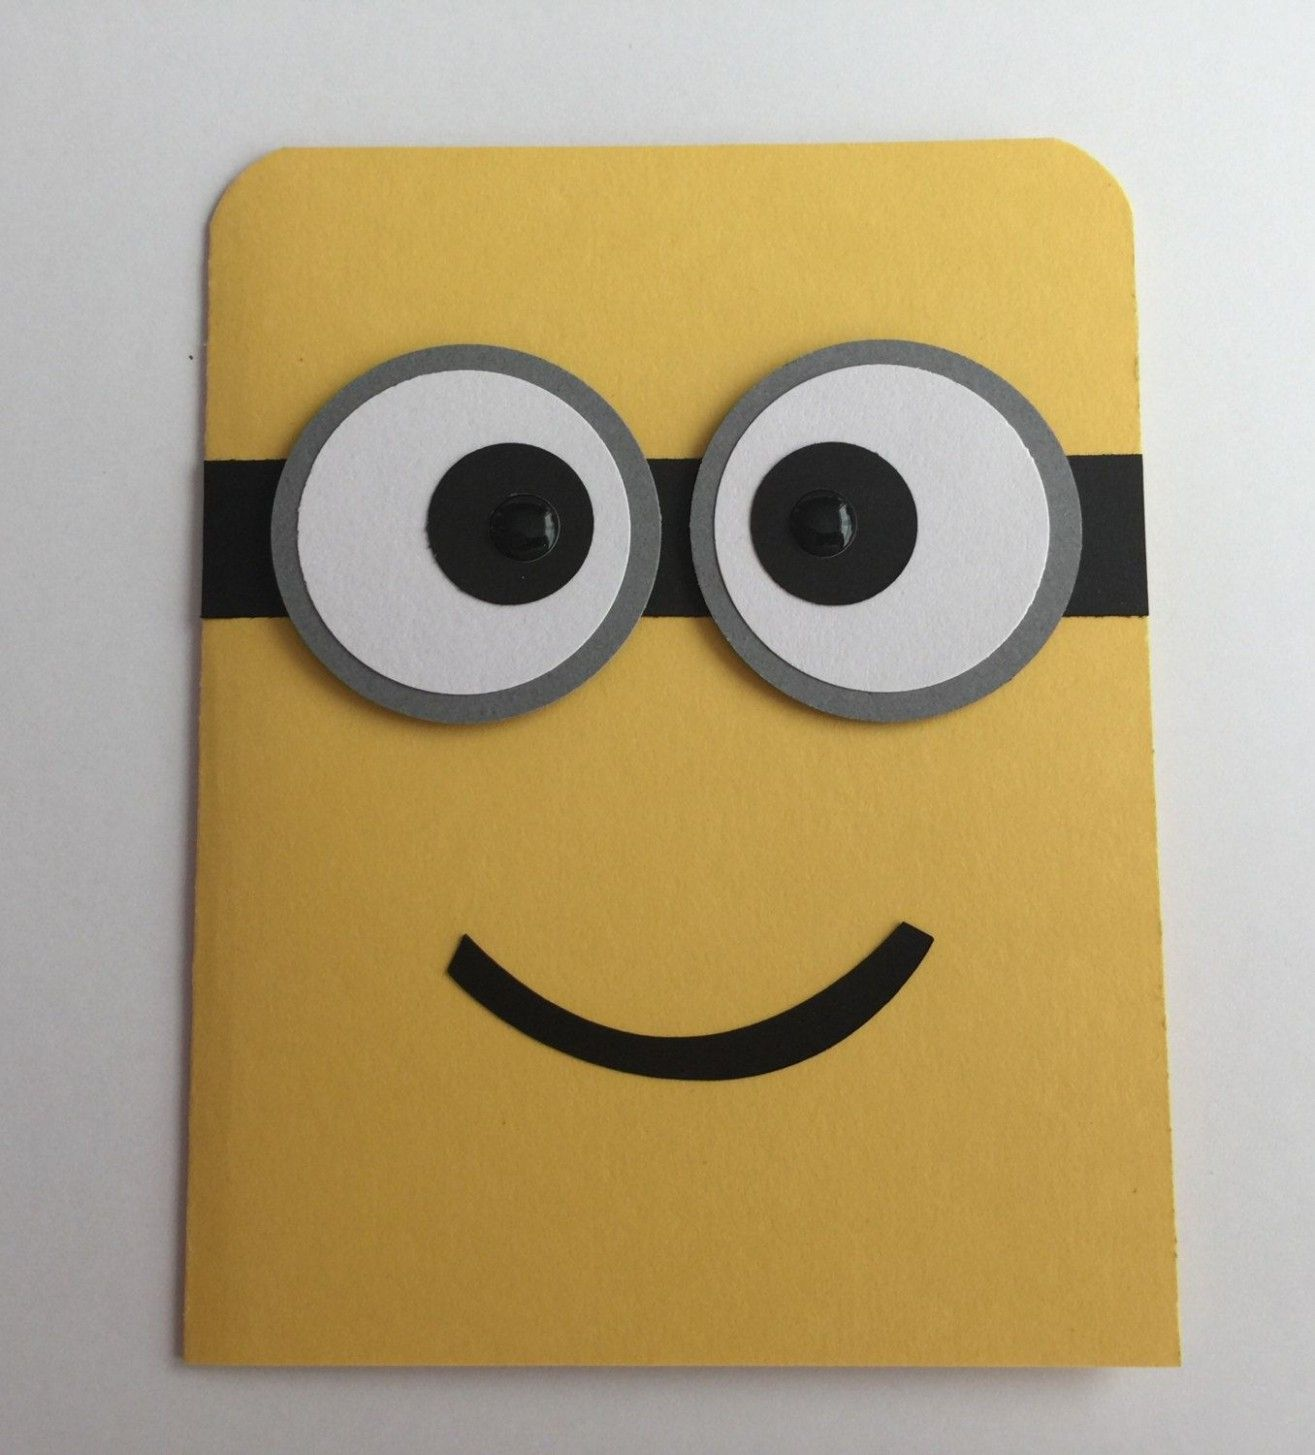 8 Top Image Minion Birthday Card In 2021 Minion Birthday Card Minion Card Birthday Cards For Boys